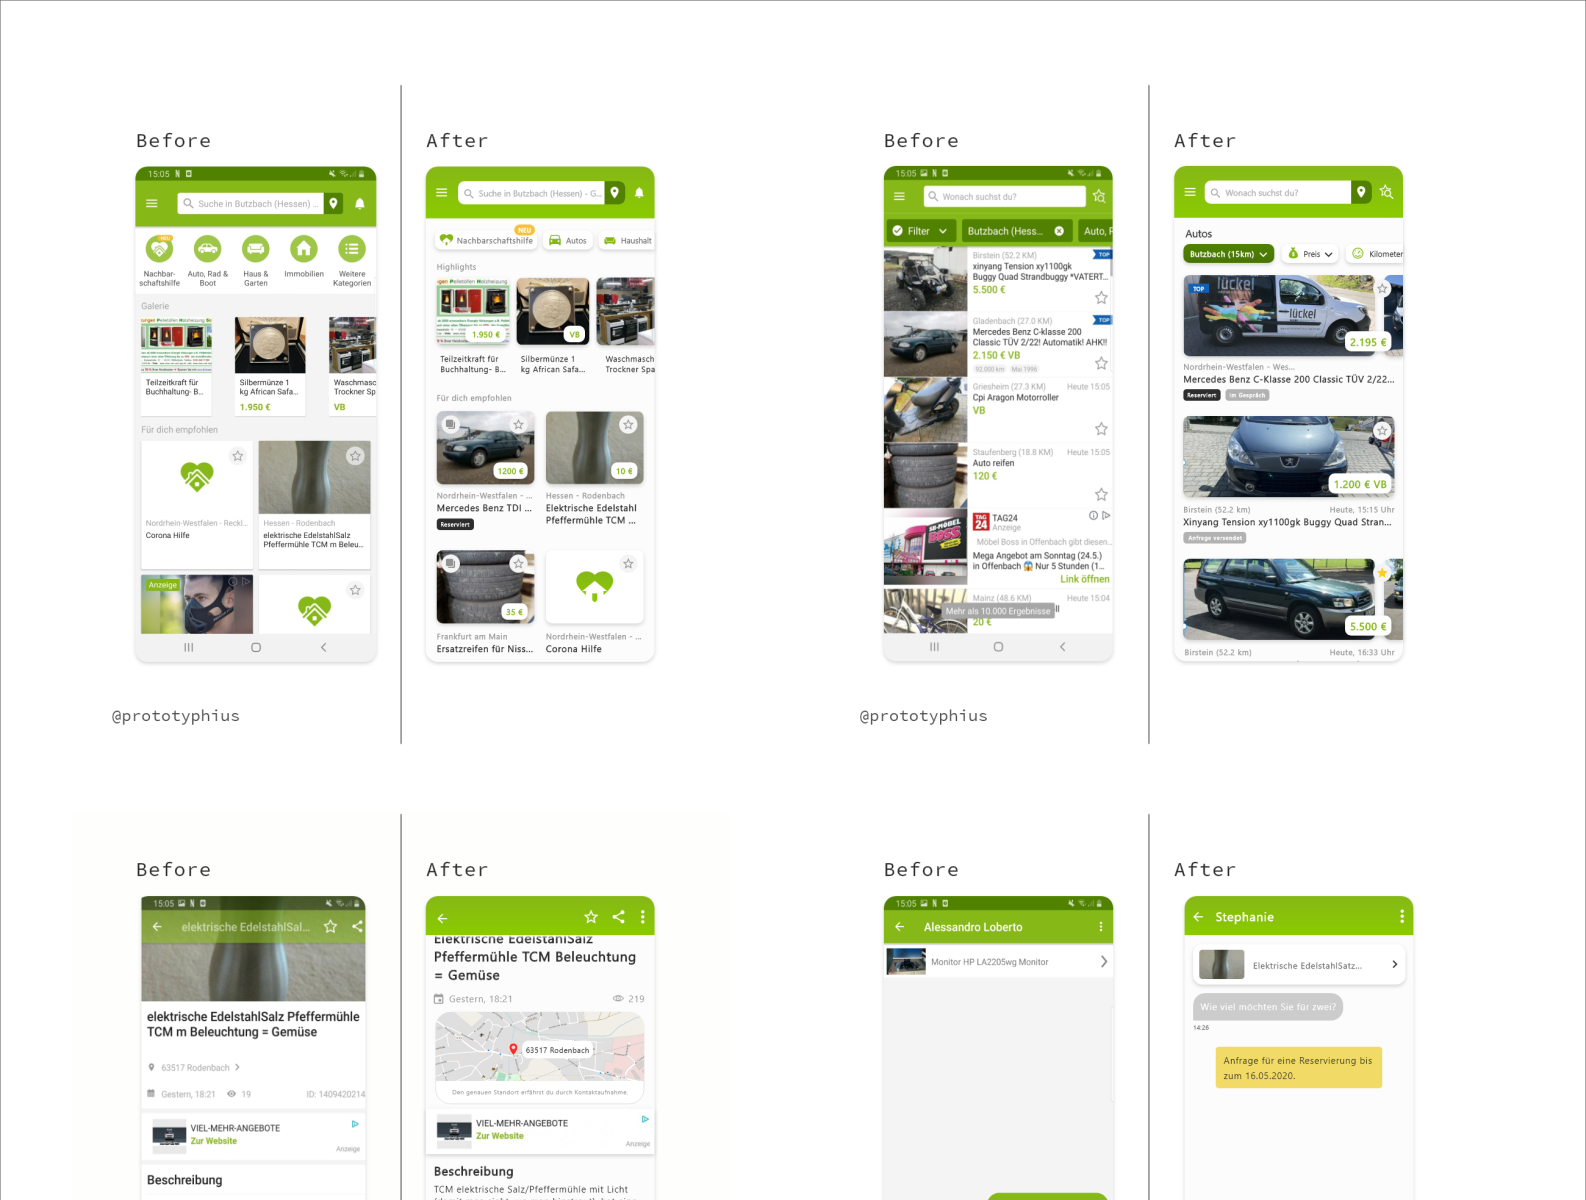 Ux Ui Case Study Of The Ebay Kleinanzeigen App By Zishan On Dribbble